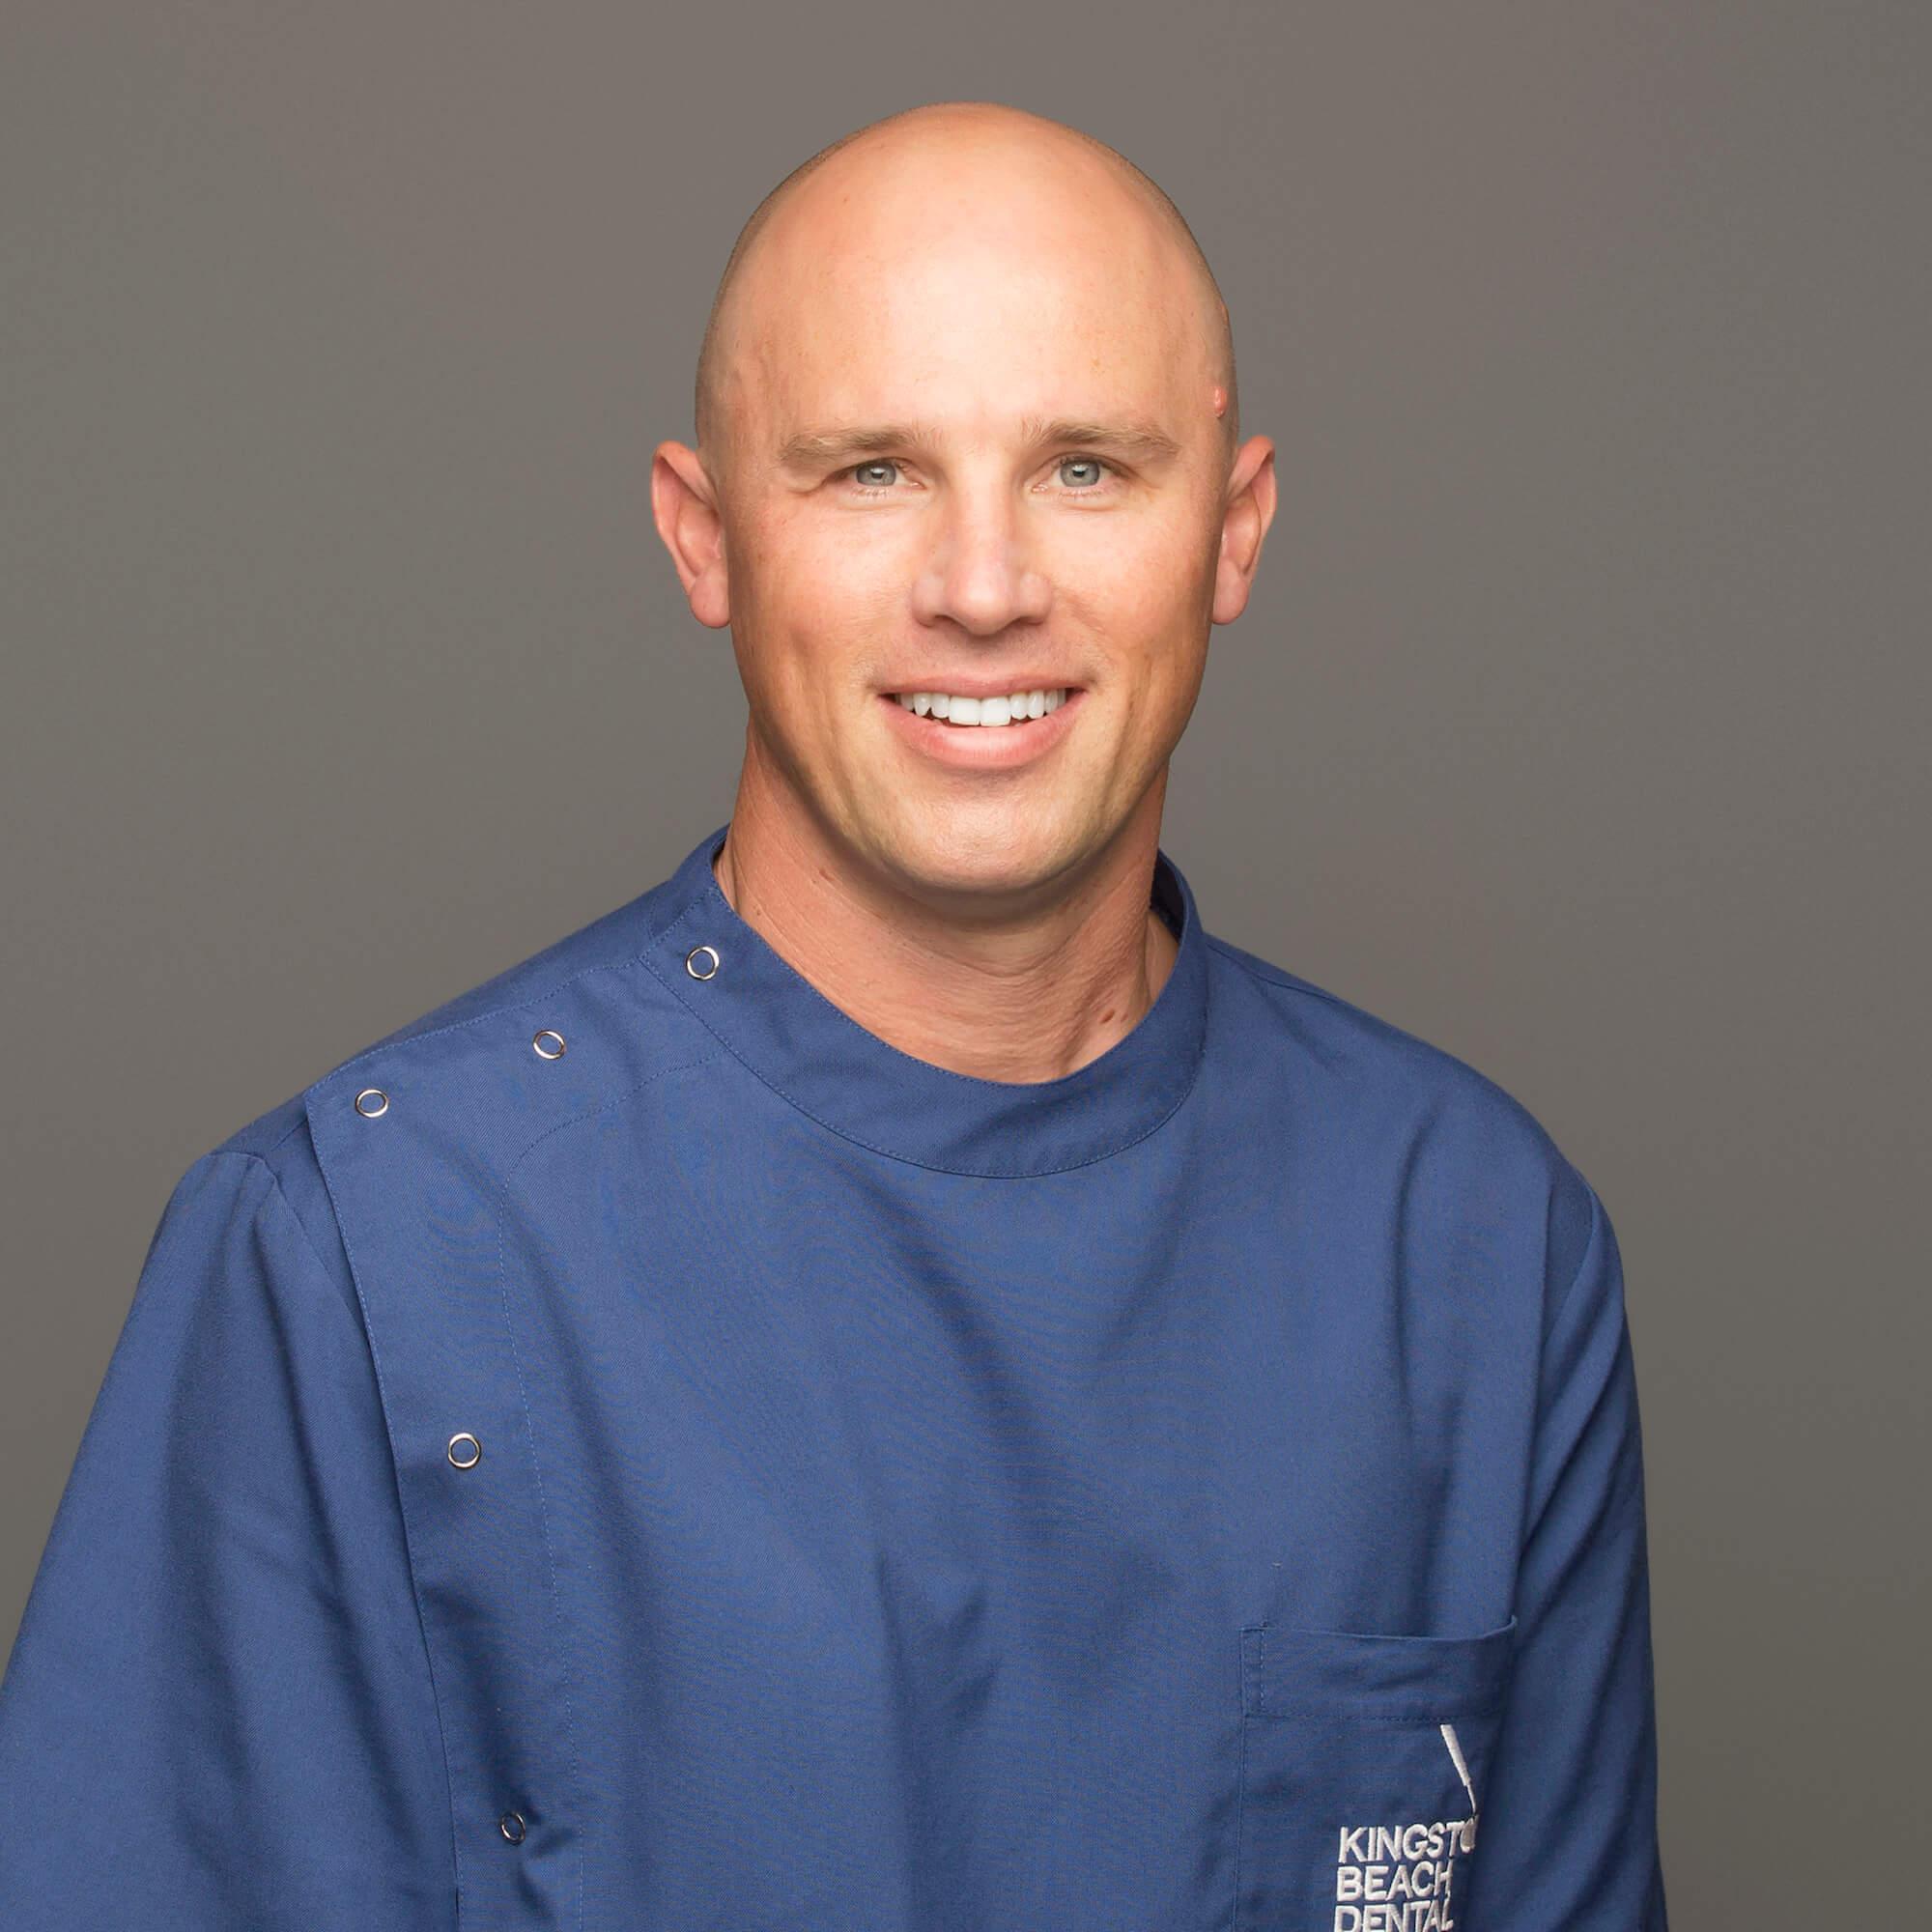 Dr Martyn Sweet Kingston Beach Dental - pain free dentist in Hobart